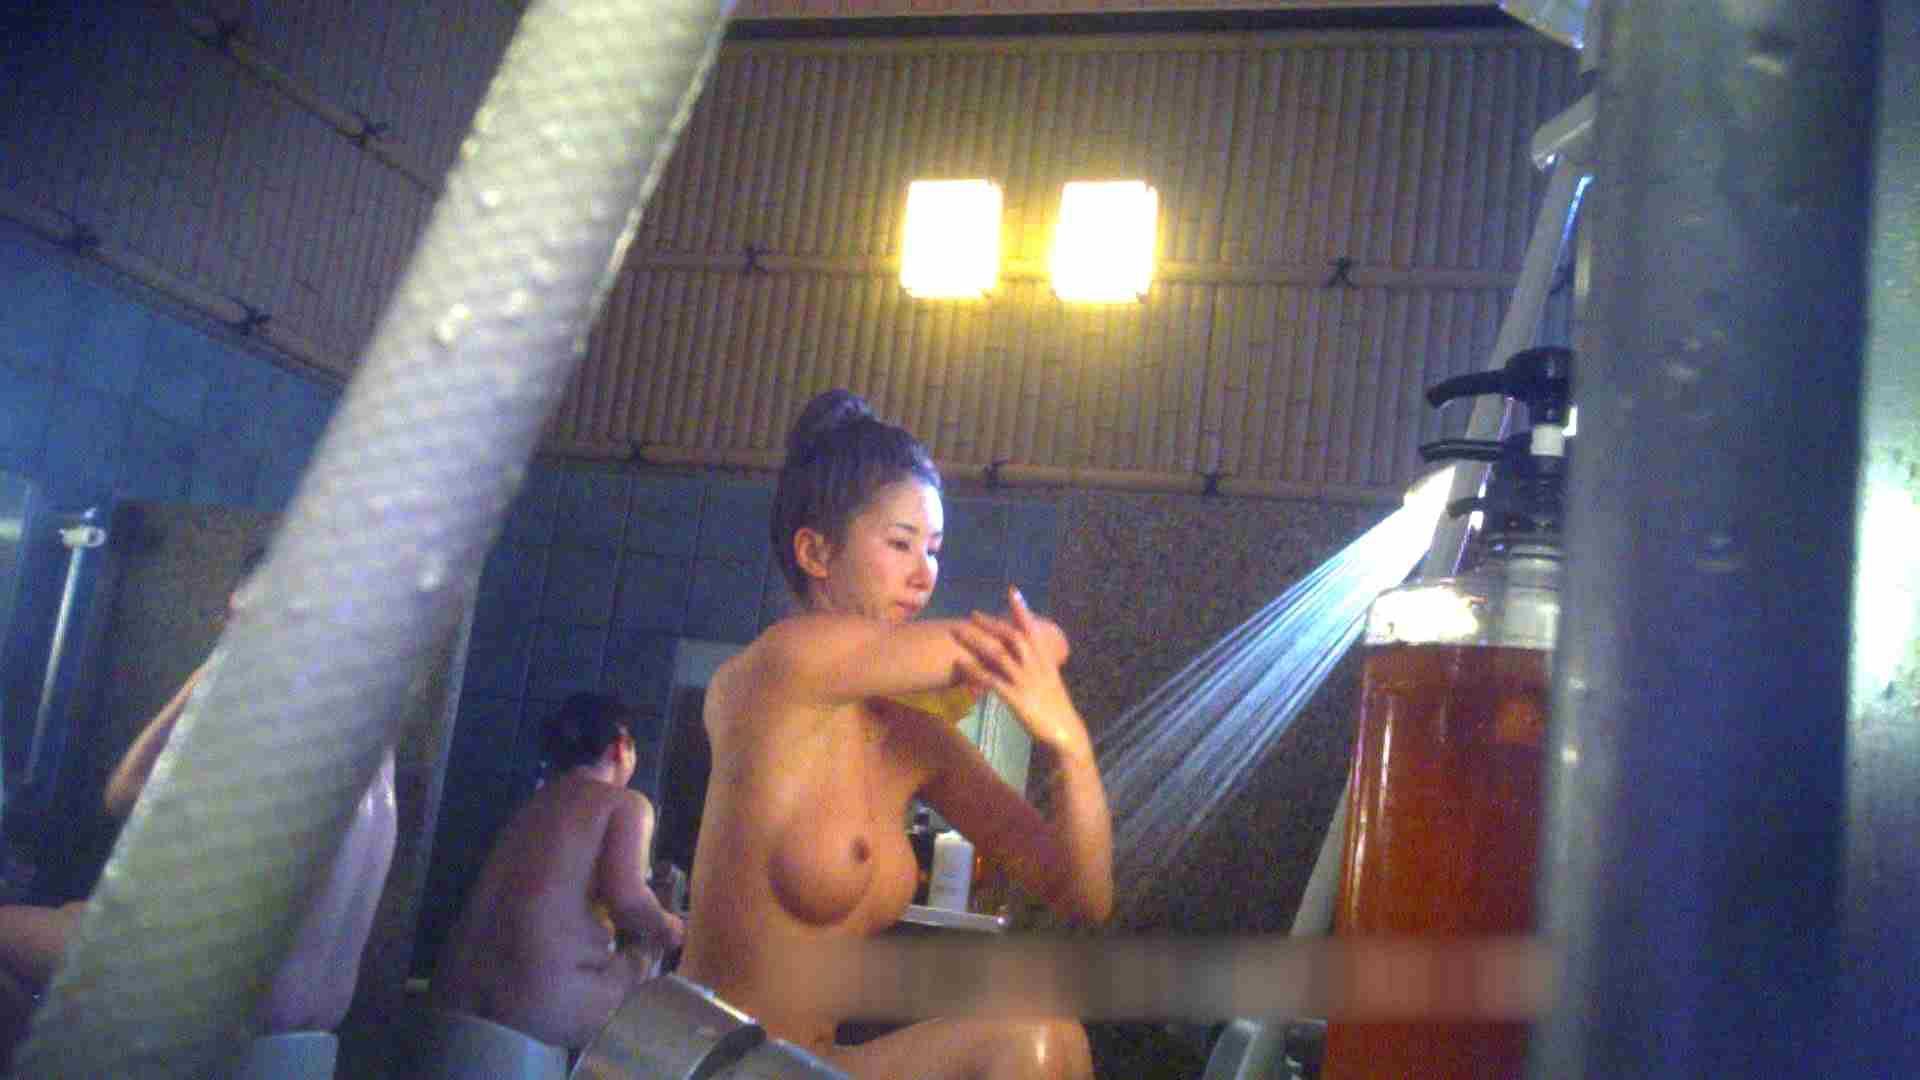 TG.15 【上等兵】高級旅館の爆乳女将で有名っぽい 潜入 隠し撮りAV無料 81pic 47